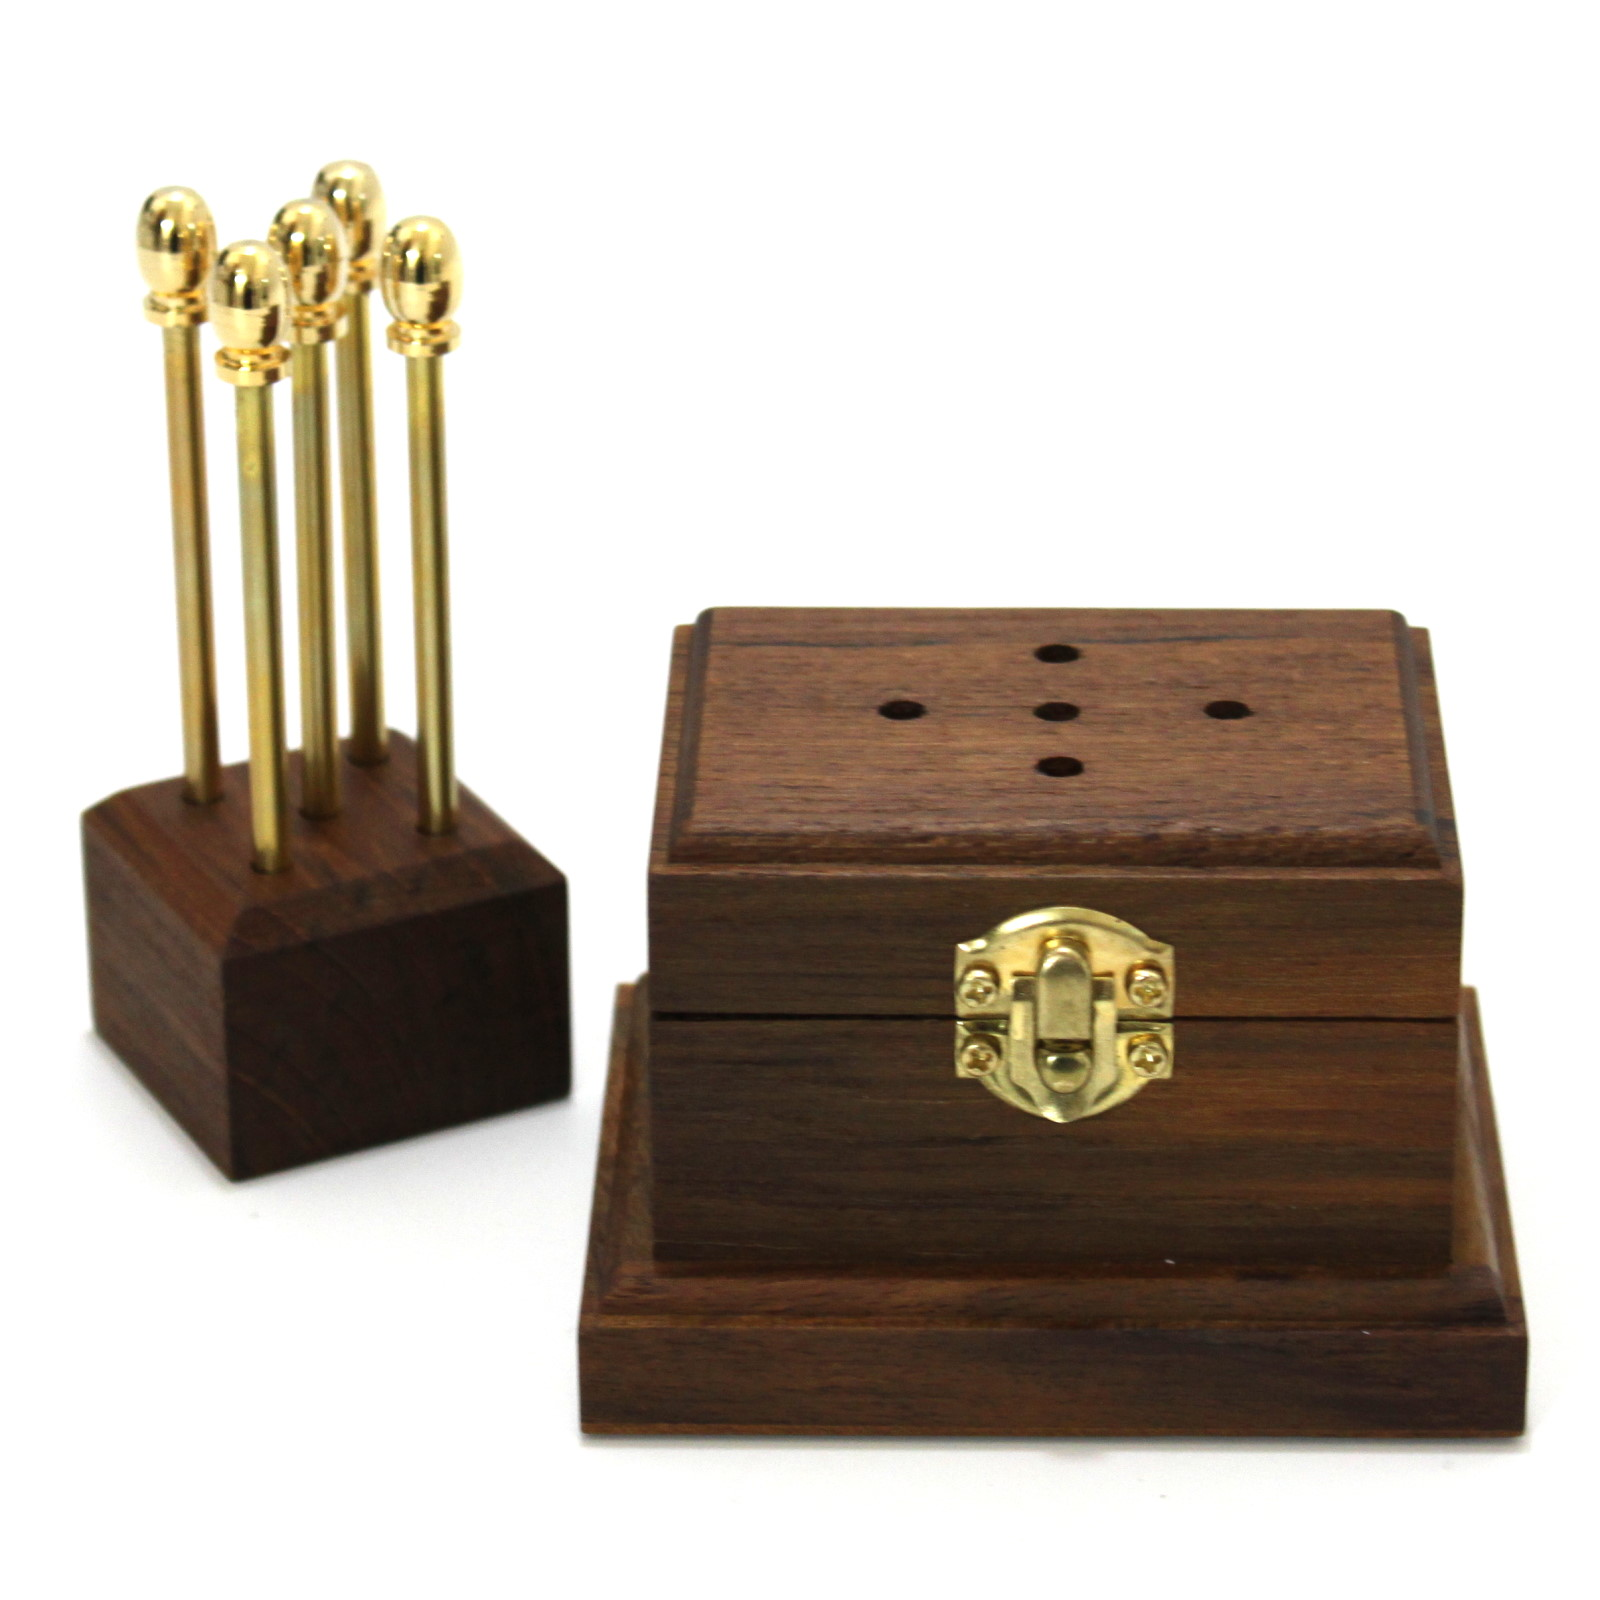 Magic Gemstone and Hieroglyphic Spells by Magic Wagon